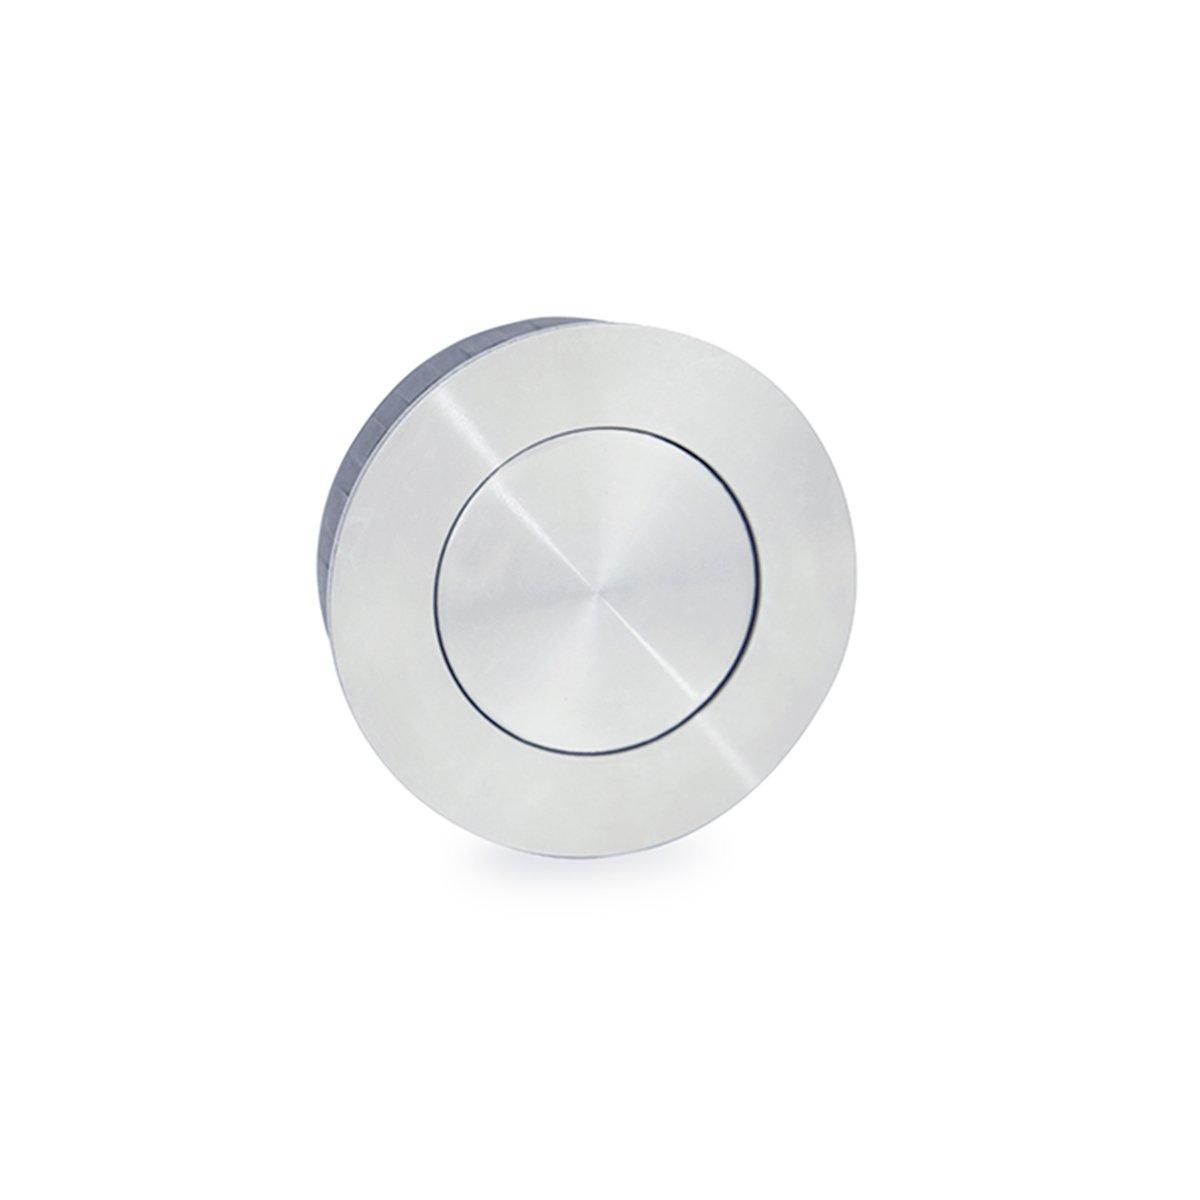 Jako WFH110X50PSS Round Flush Pull - Polish Stainless Steel, Diameter 2''